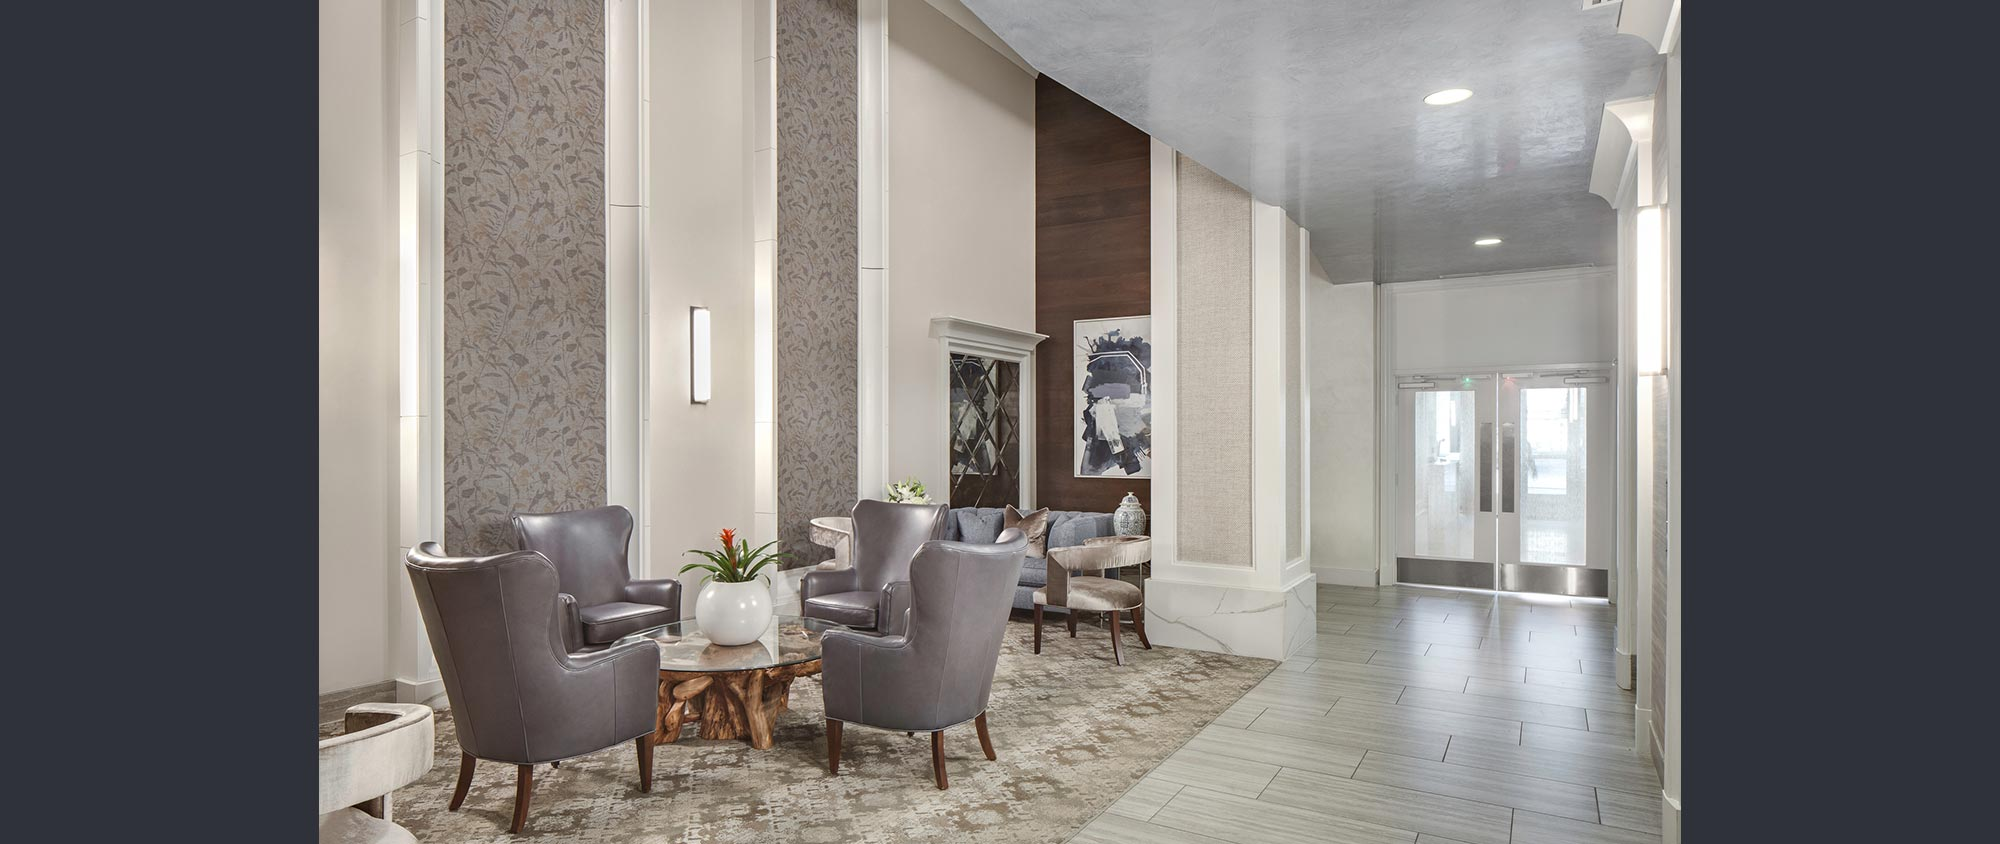 Viridian Lobby Renovation